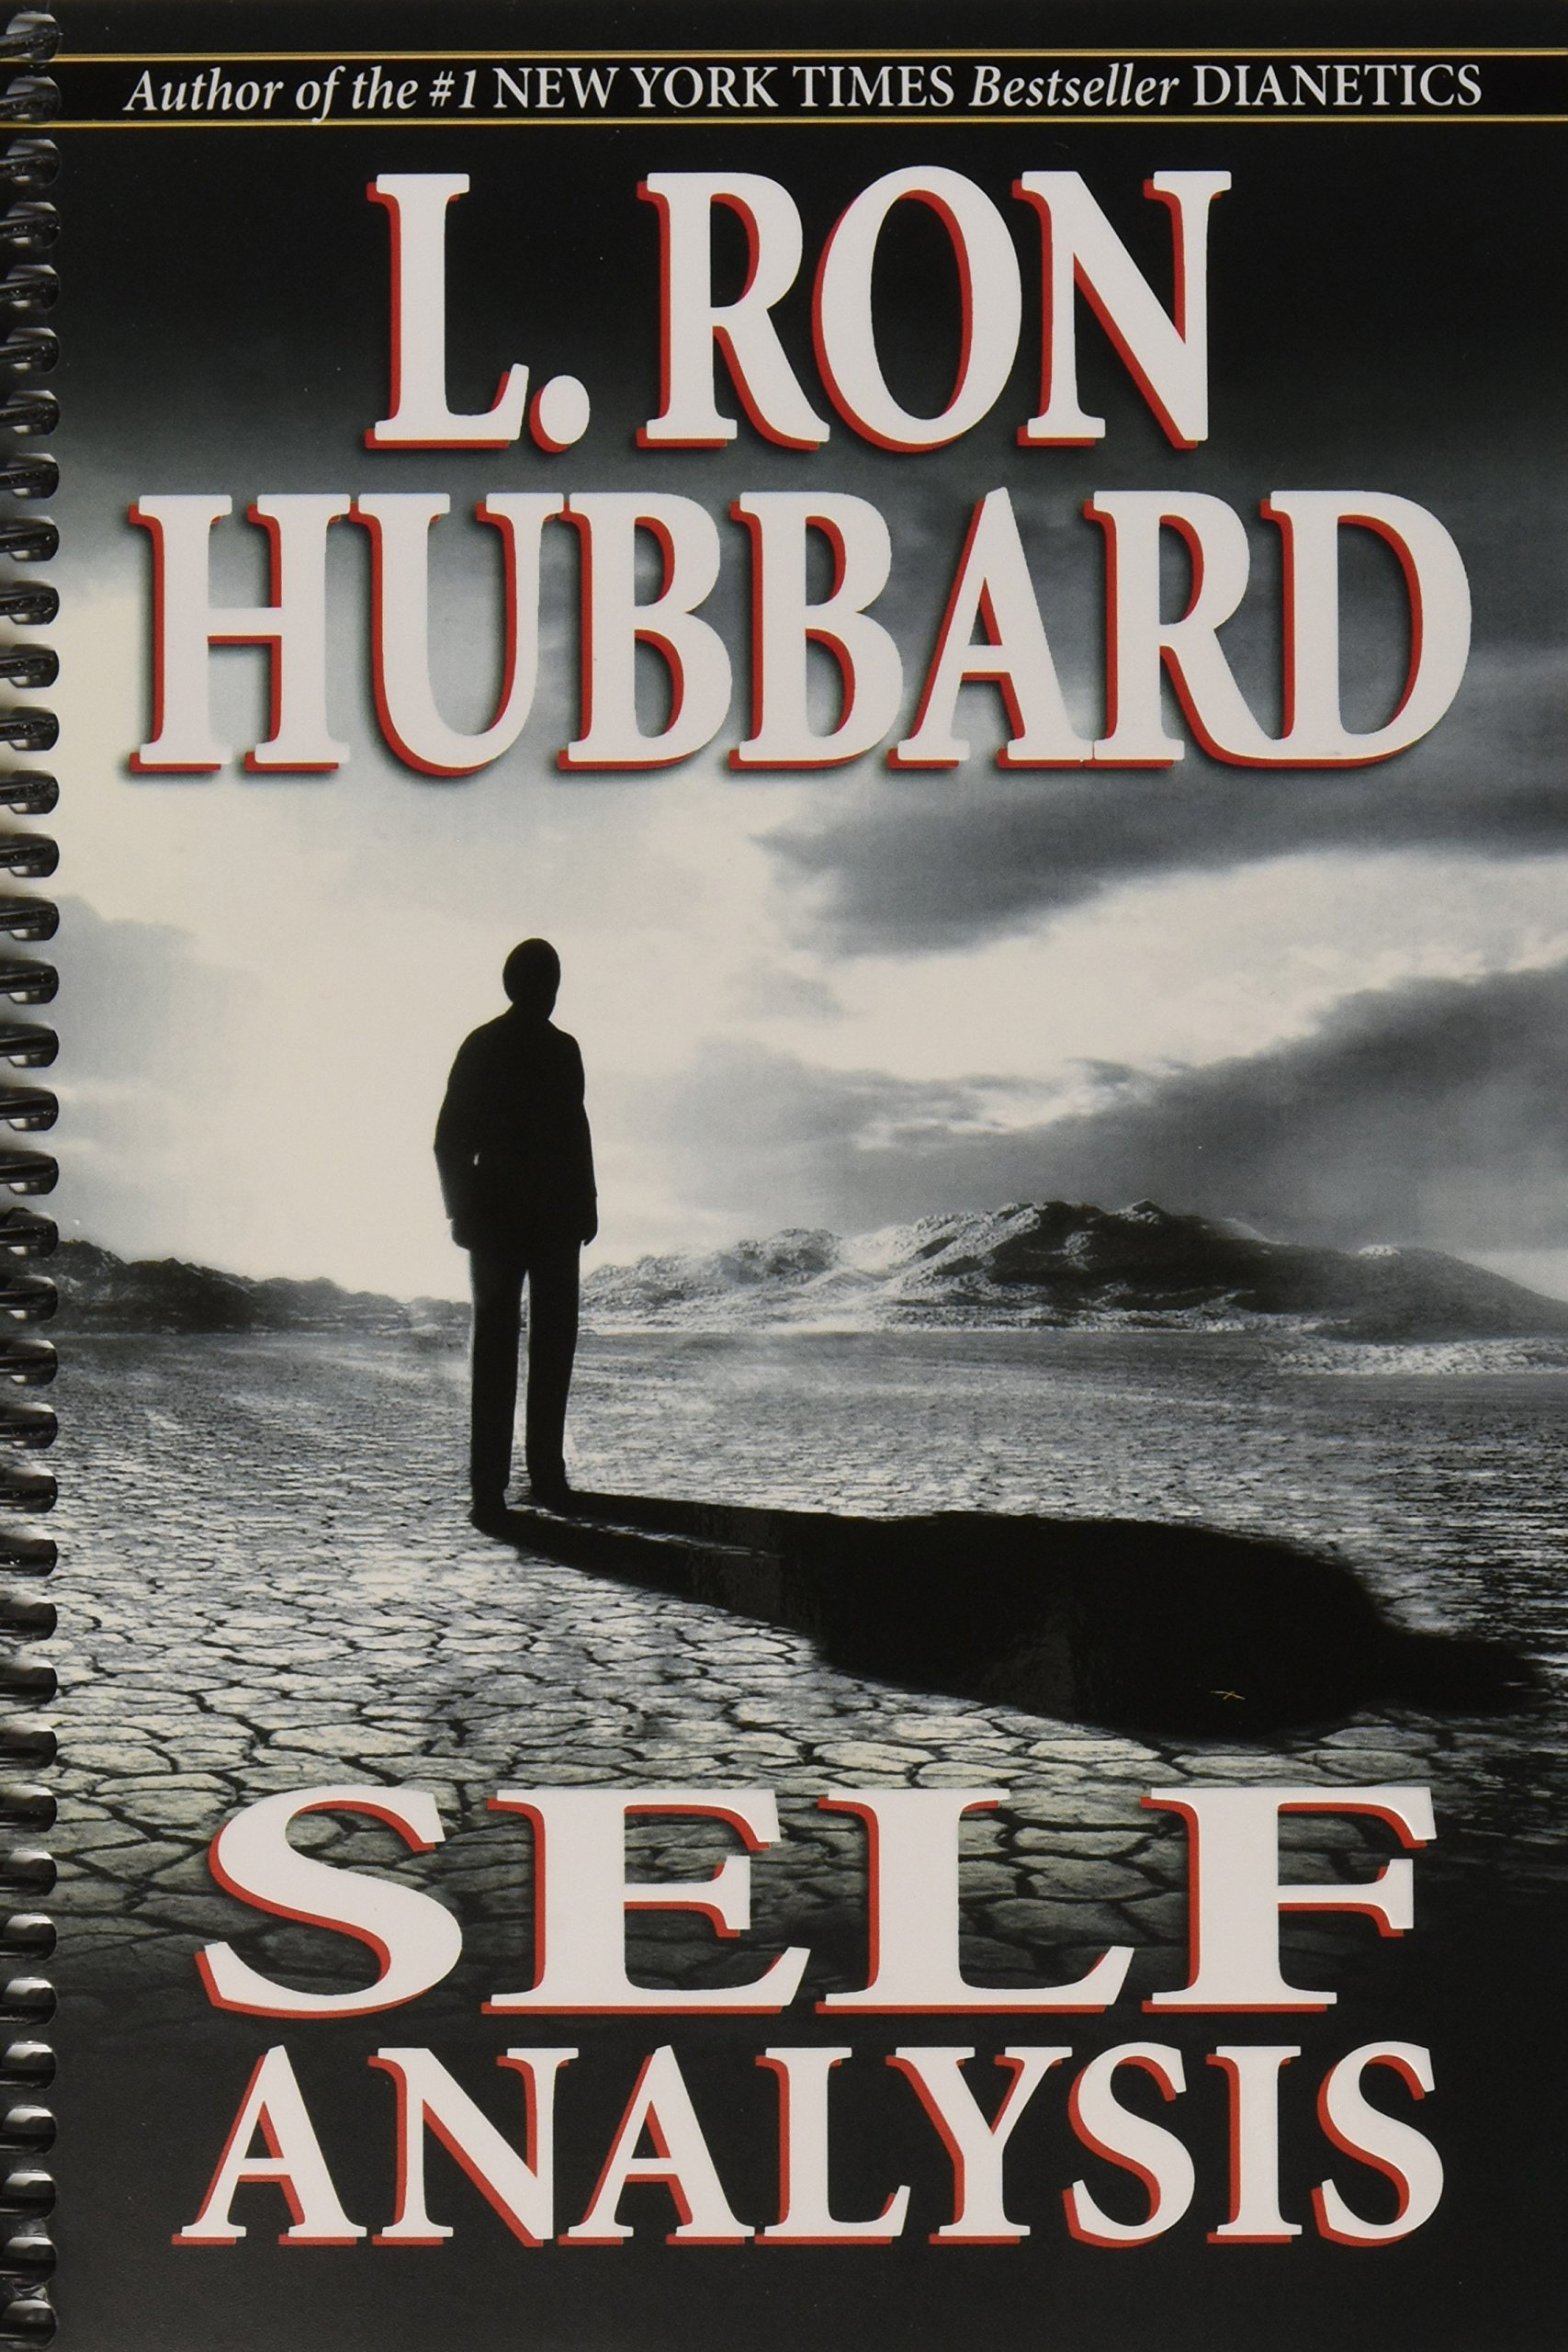 Self-Analysis-by-Ron-Hubbard-pdf.jpg